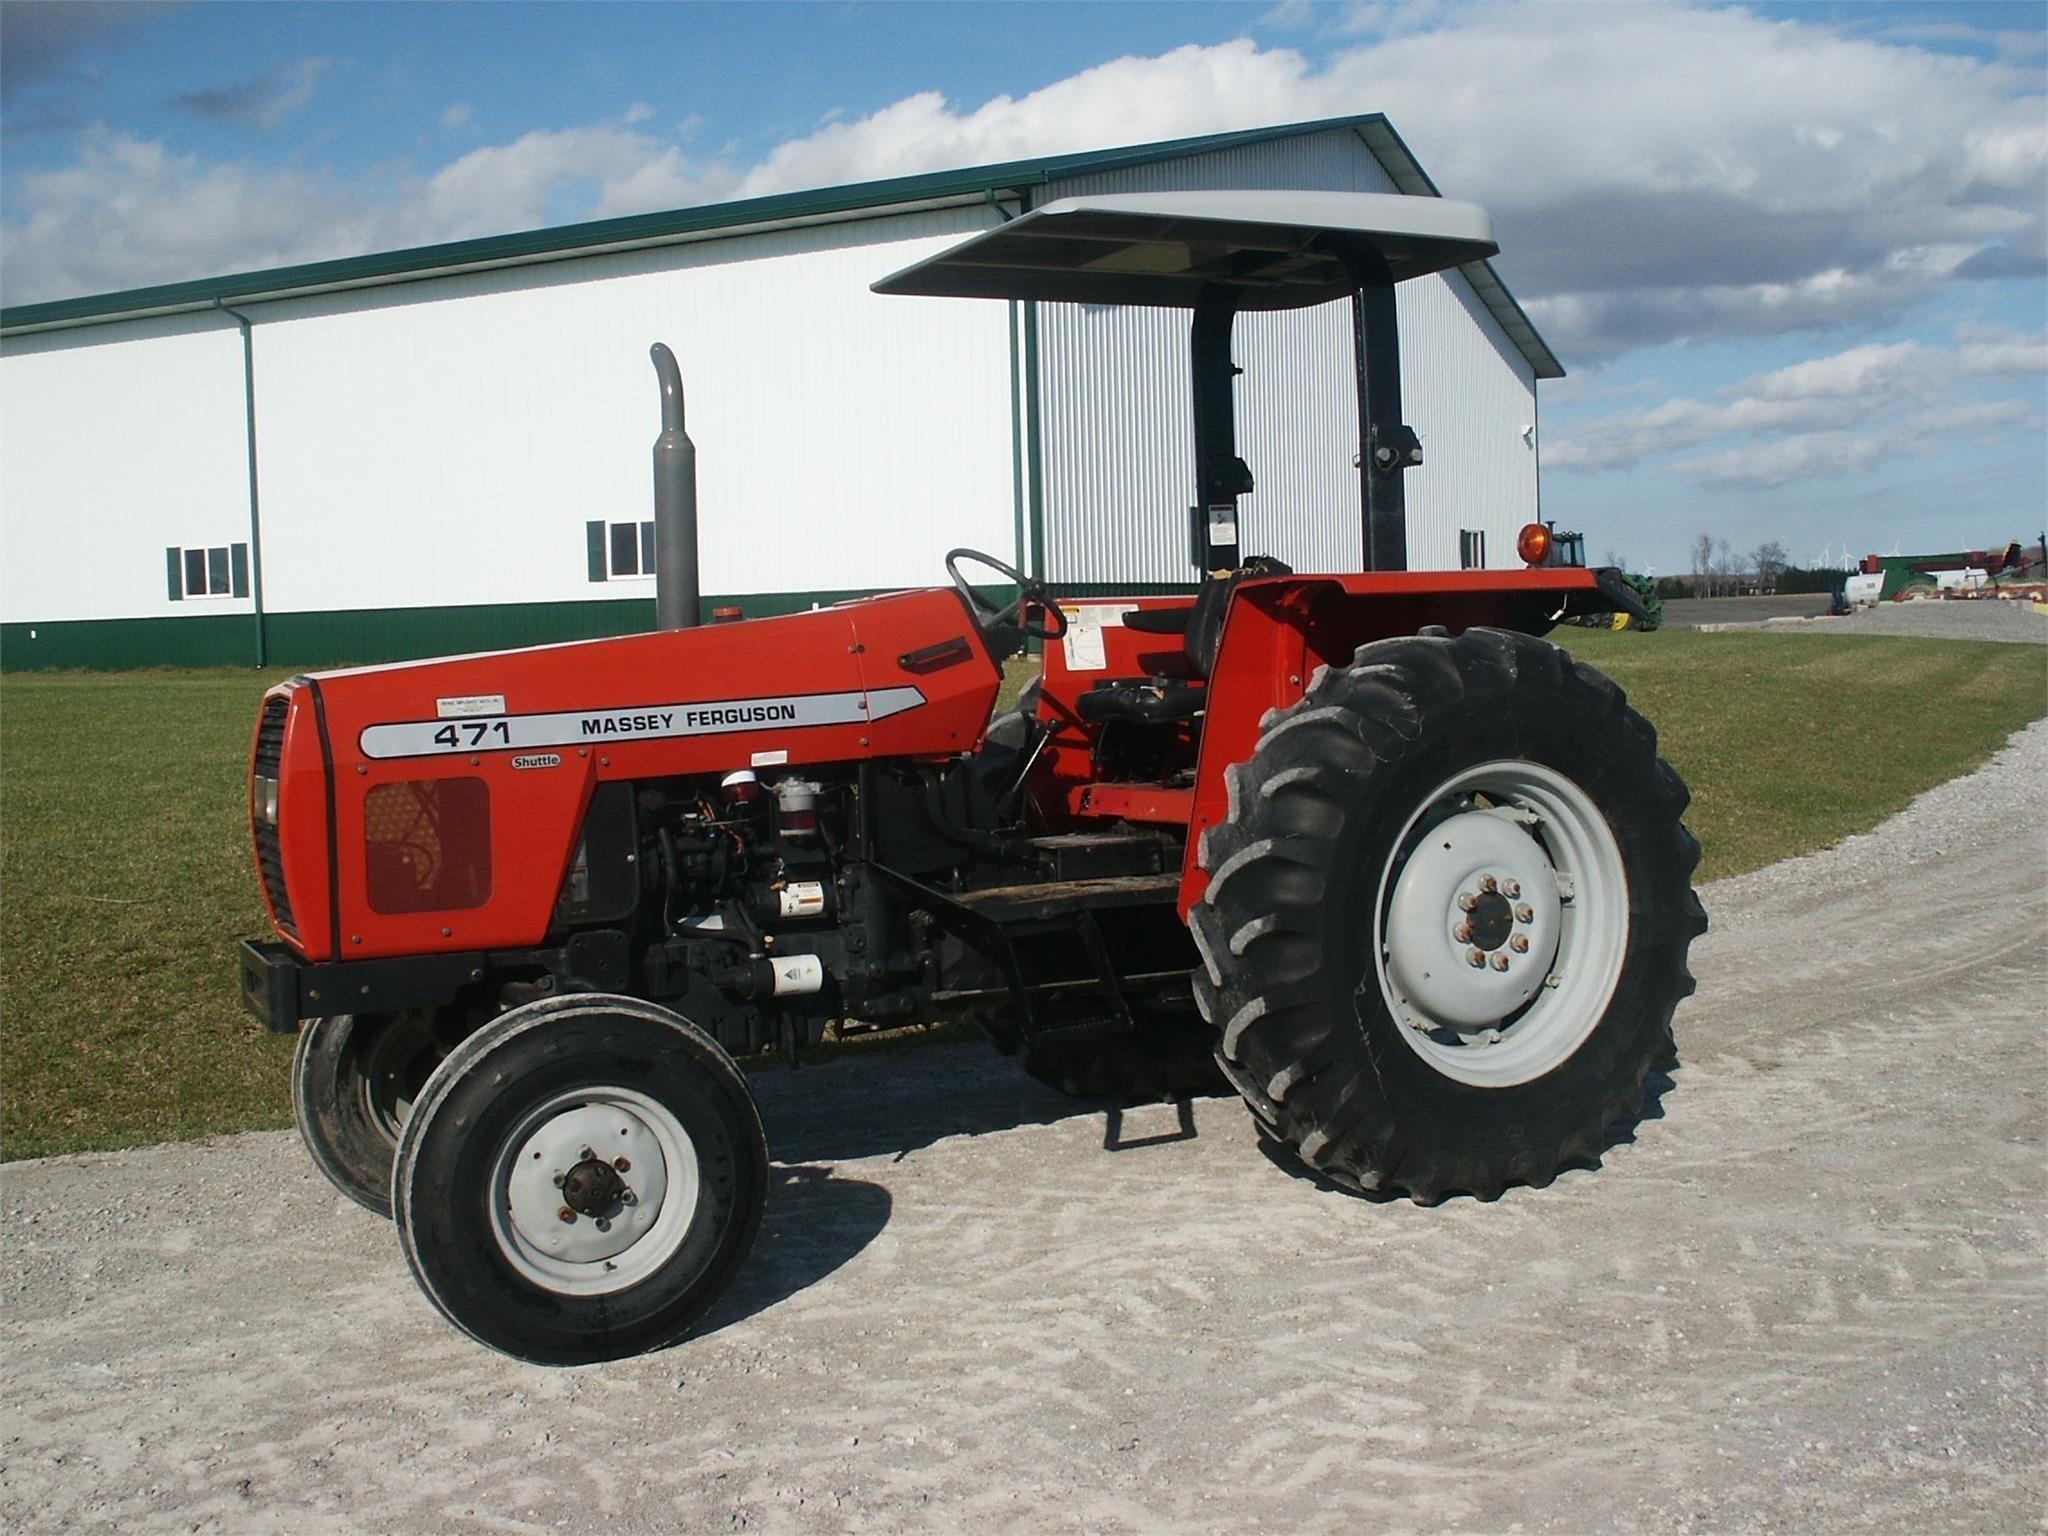 2003 Massey Ferguson 471 Tractor